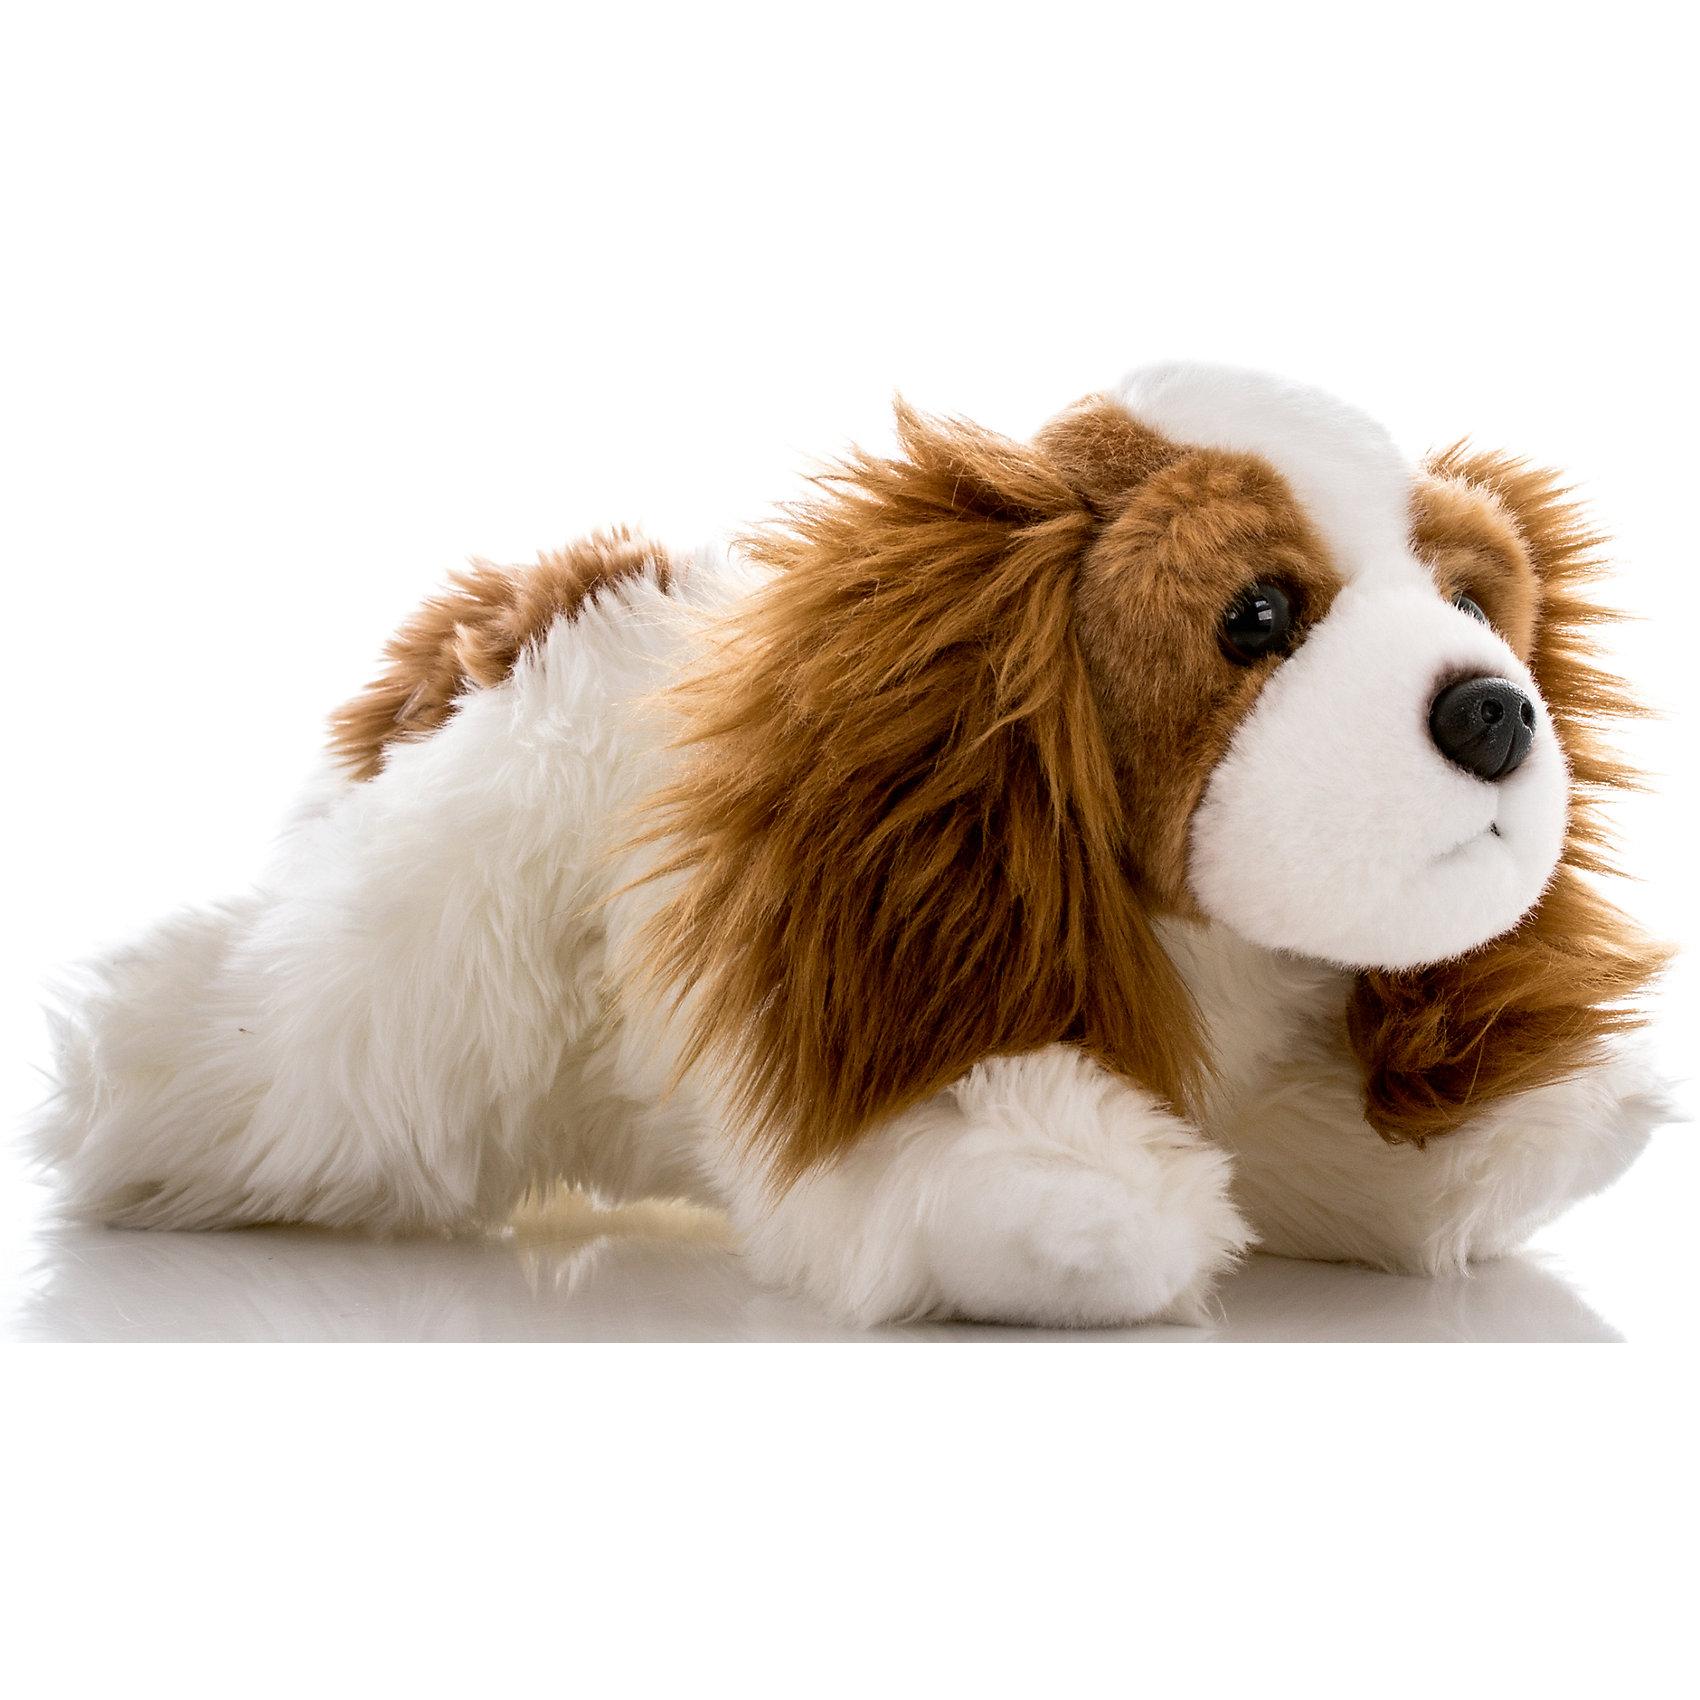 AURORA Мягкая игрушка Кинг чарльз спаниель, 28 см, AURORA aurora мягкая игрушка тигр 28 см